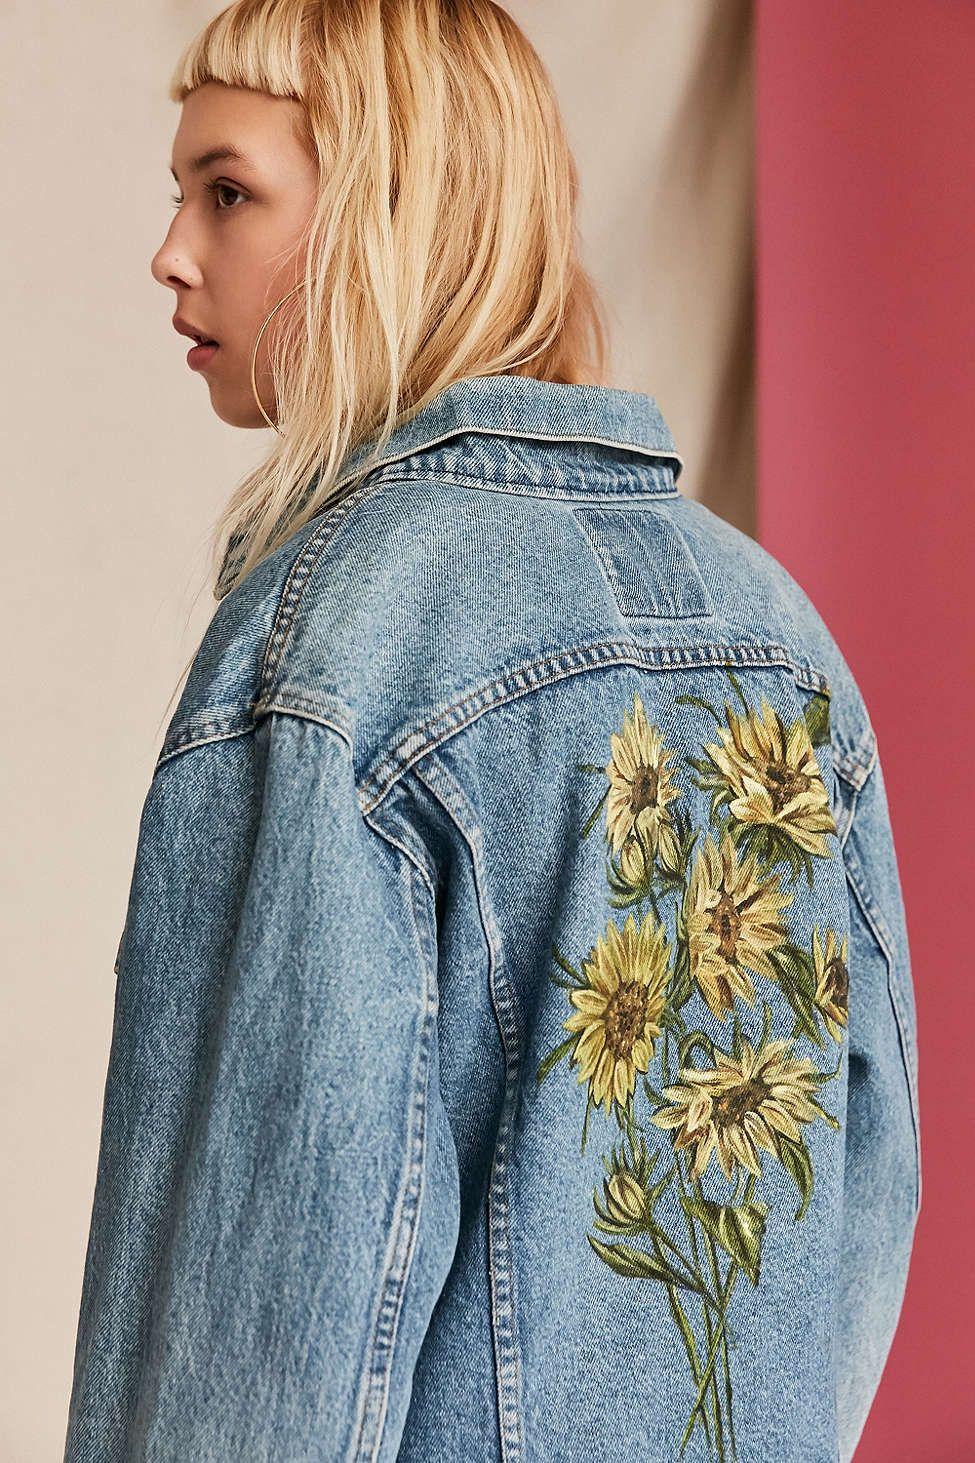 a76688c2d027 UO Design X Urban Renewal Vintage Floral Painted Denim Jacket